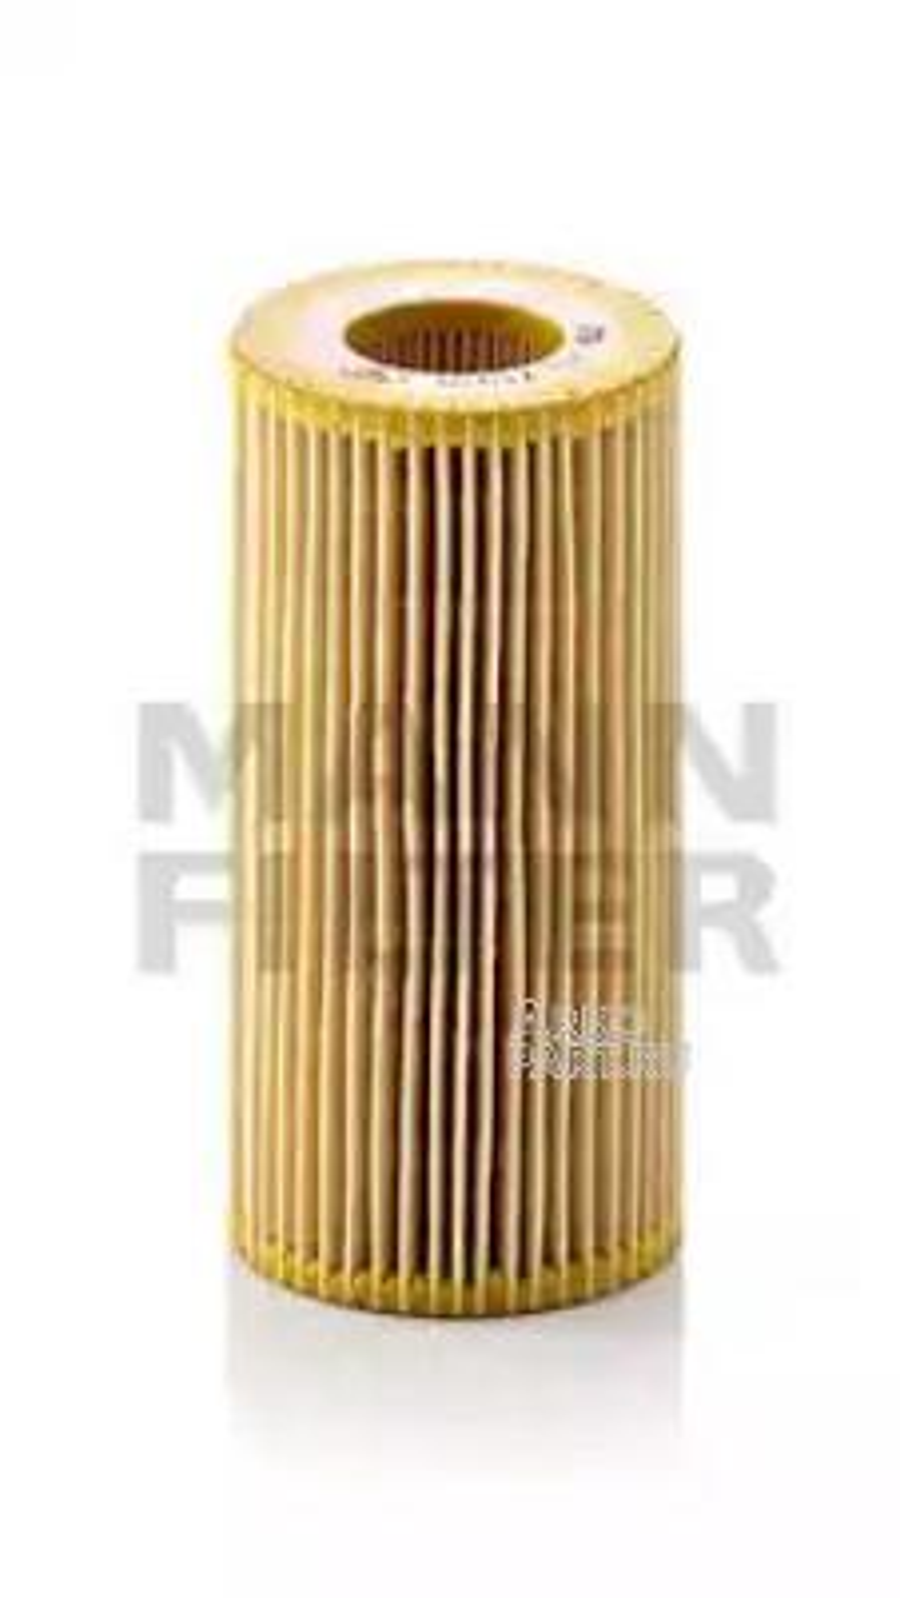 HU 719/8 Y_фильтр масляный !\Volvo S40/V50/V70/C70/XC70/XC90 2.4/2.5 01>